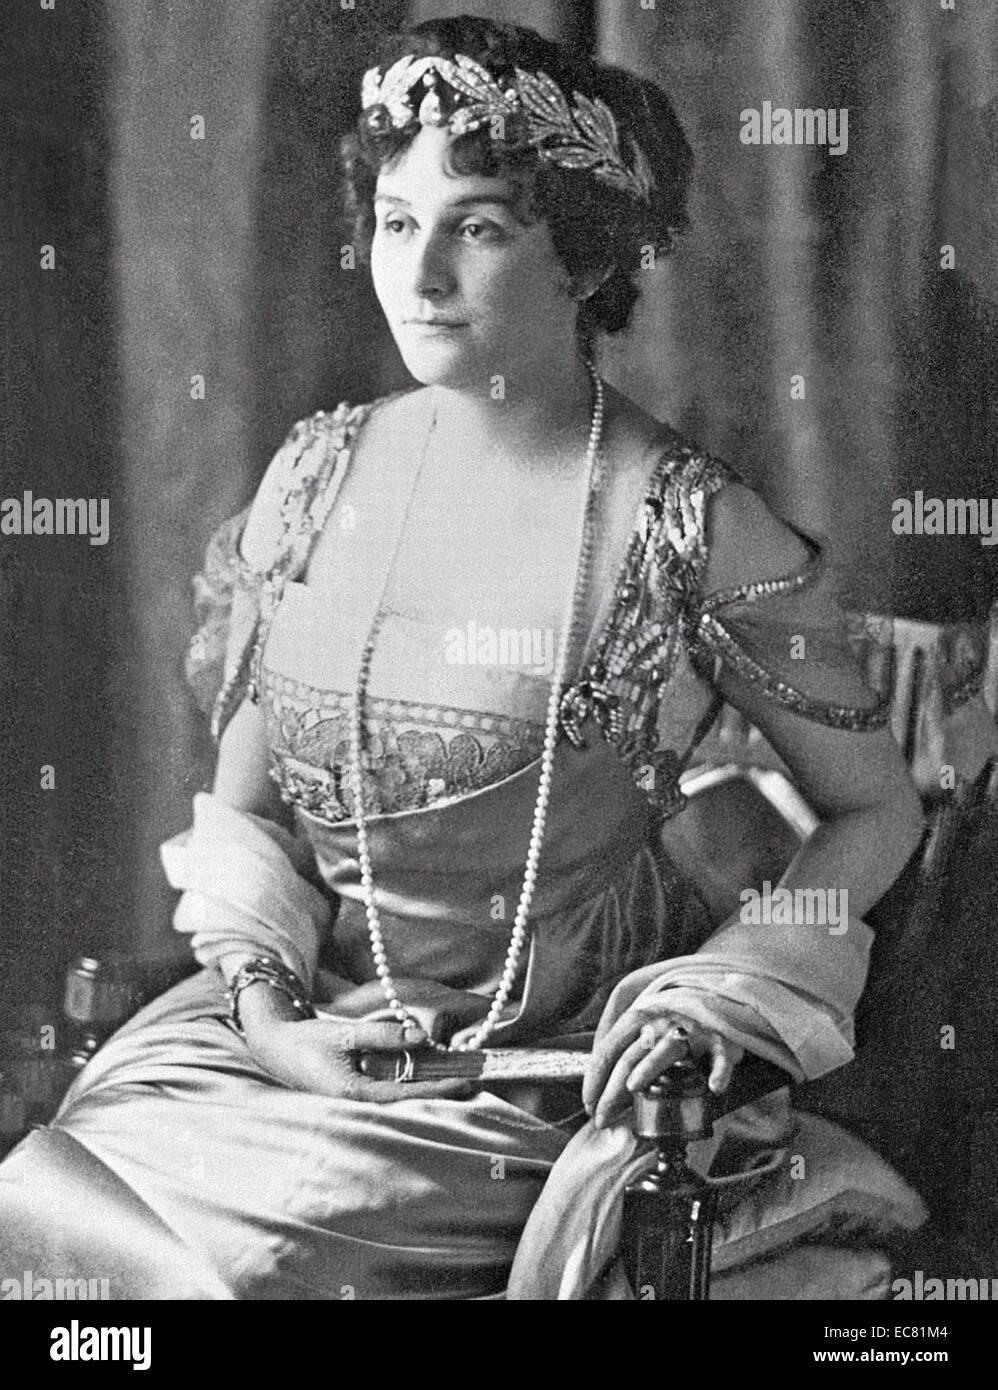 Photograph of Princess Marie Bonaparte - Stock Image